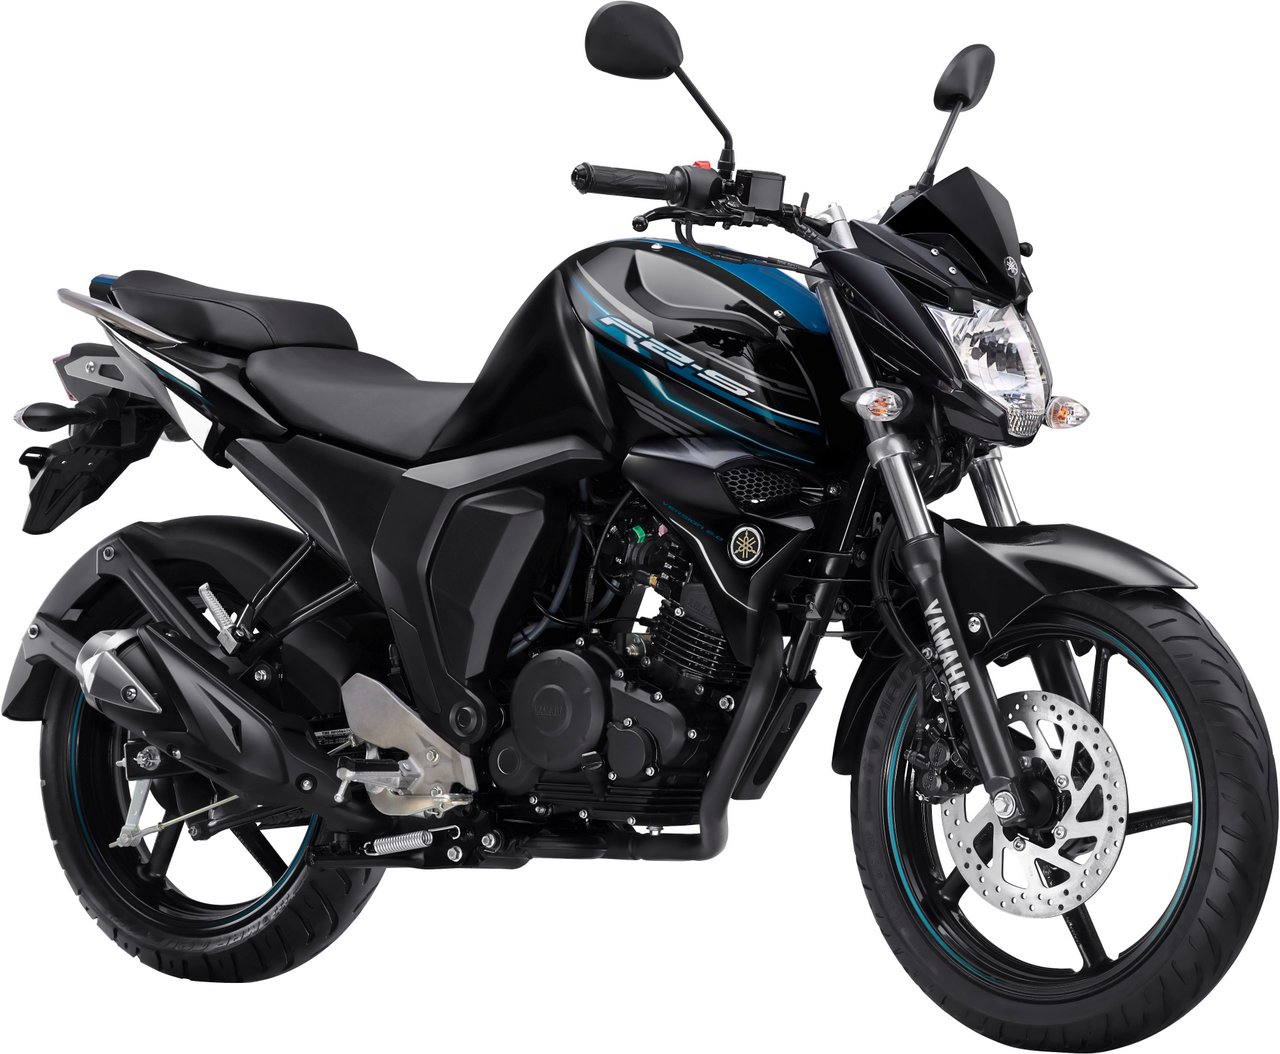 2015-Yamaha-FZ-S-FI-Viper-Black